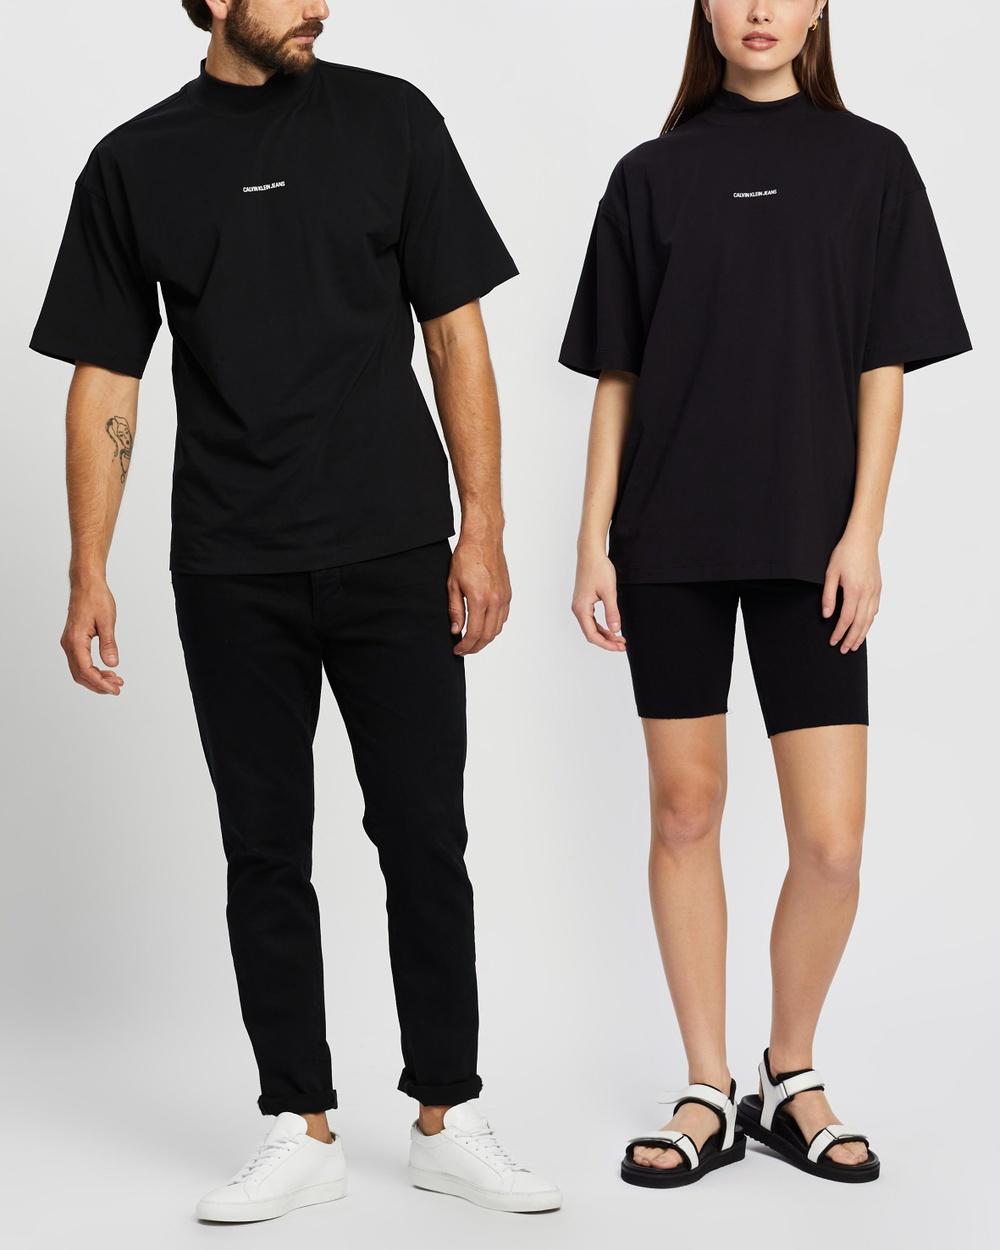 Calvin Klein Jeans - Micro Branding Mock Neck   Unisex - T-Shirts & Singlets (CK Black) Micro Branding Mock Neck - Unisex